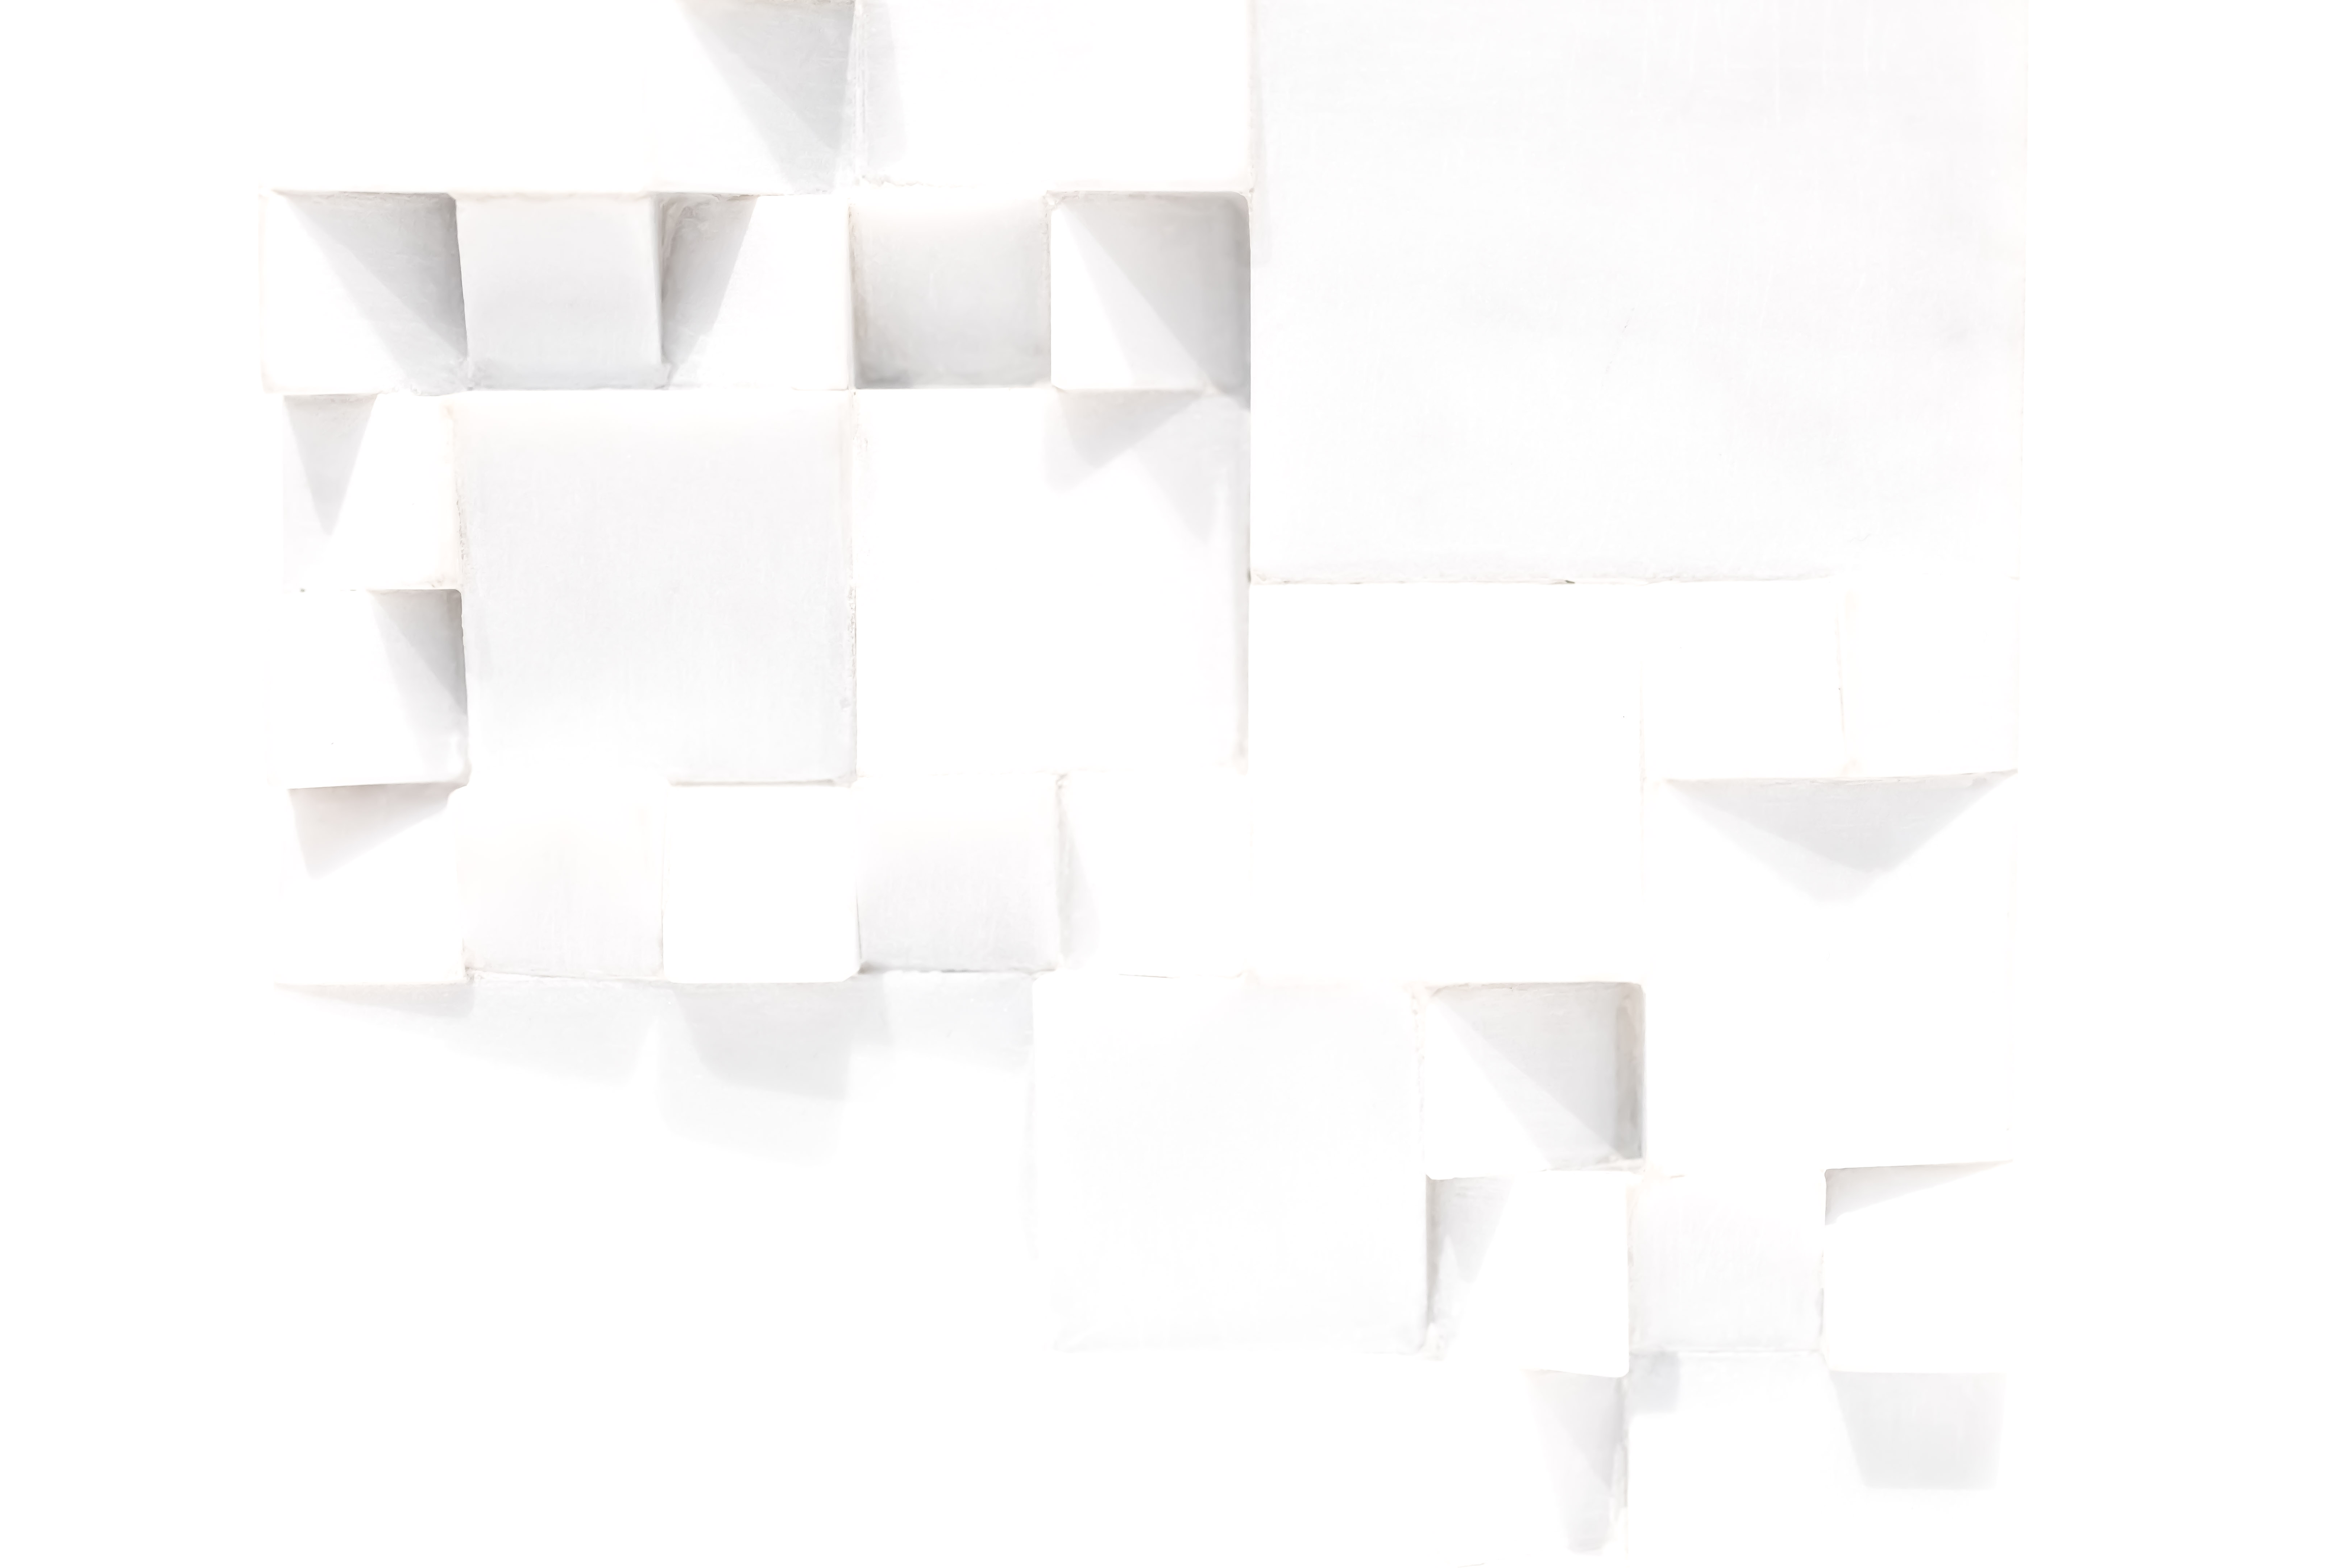 White Cubist Emerging